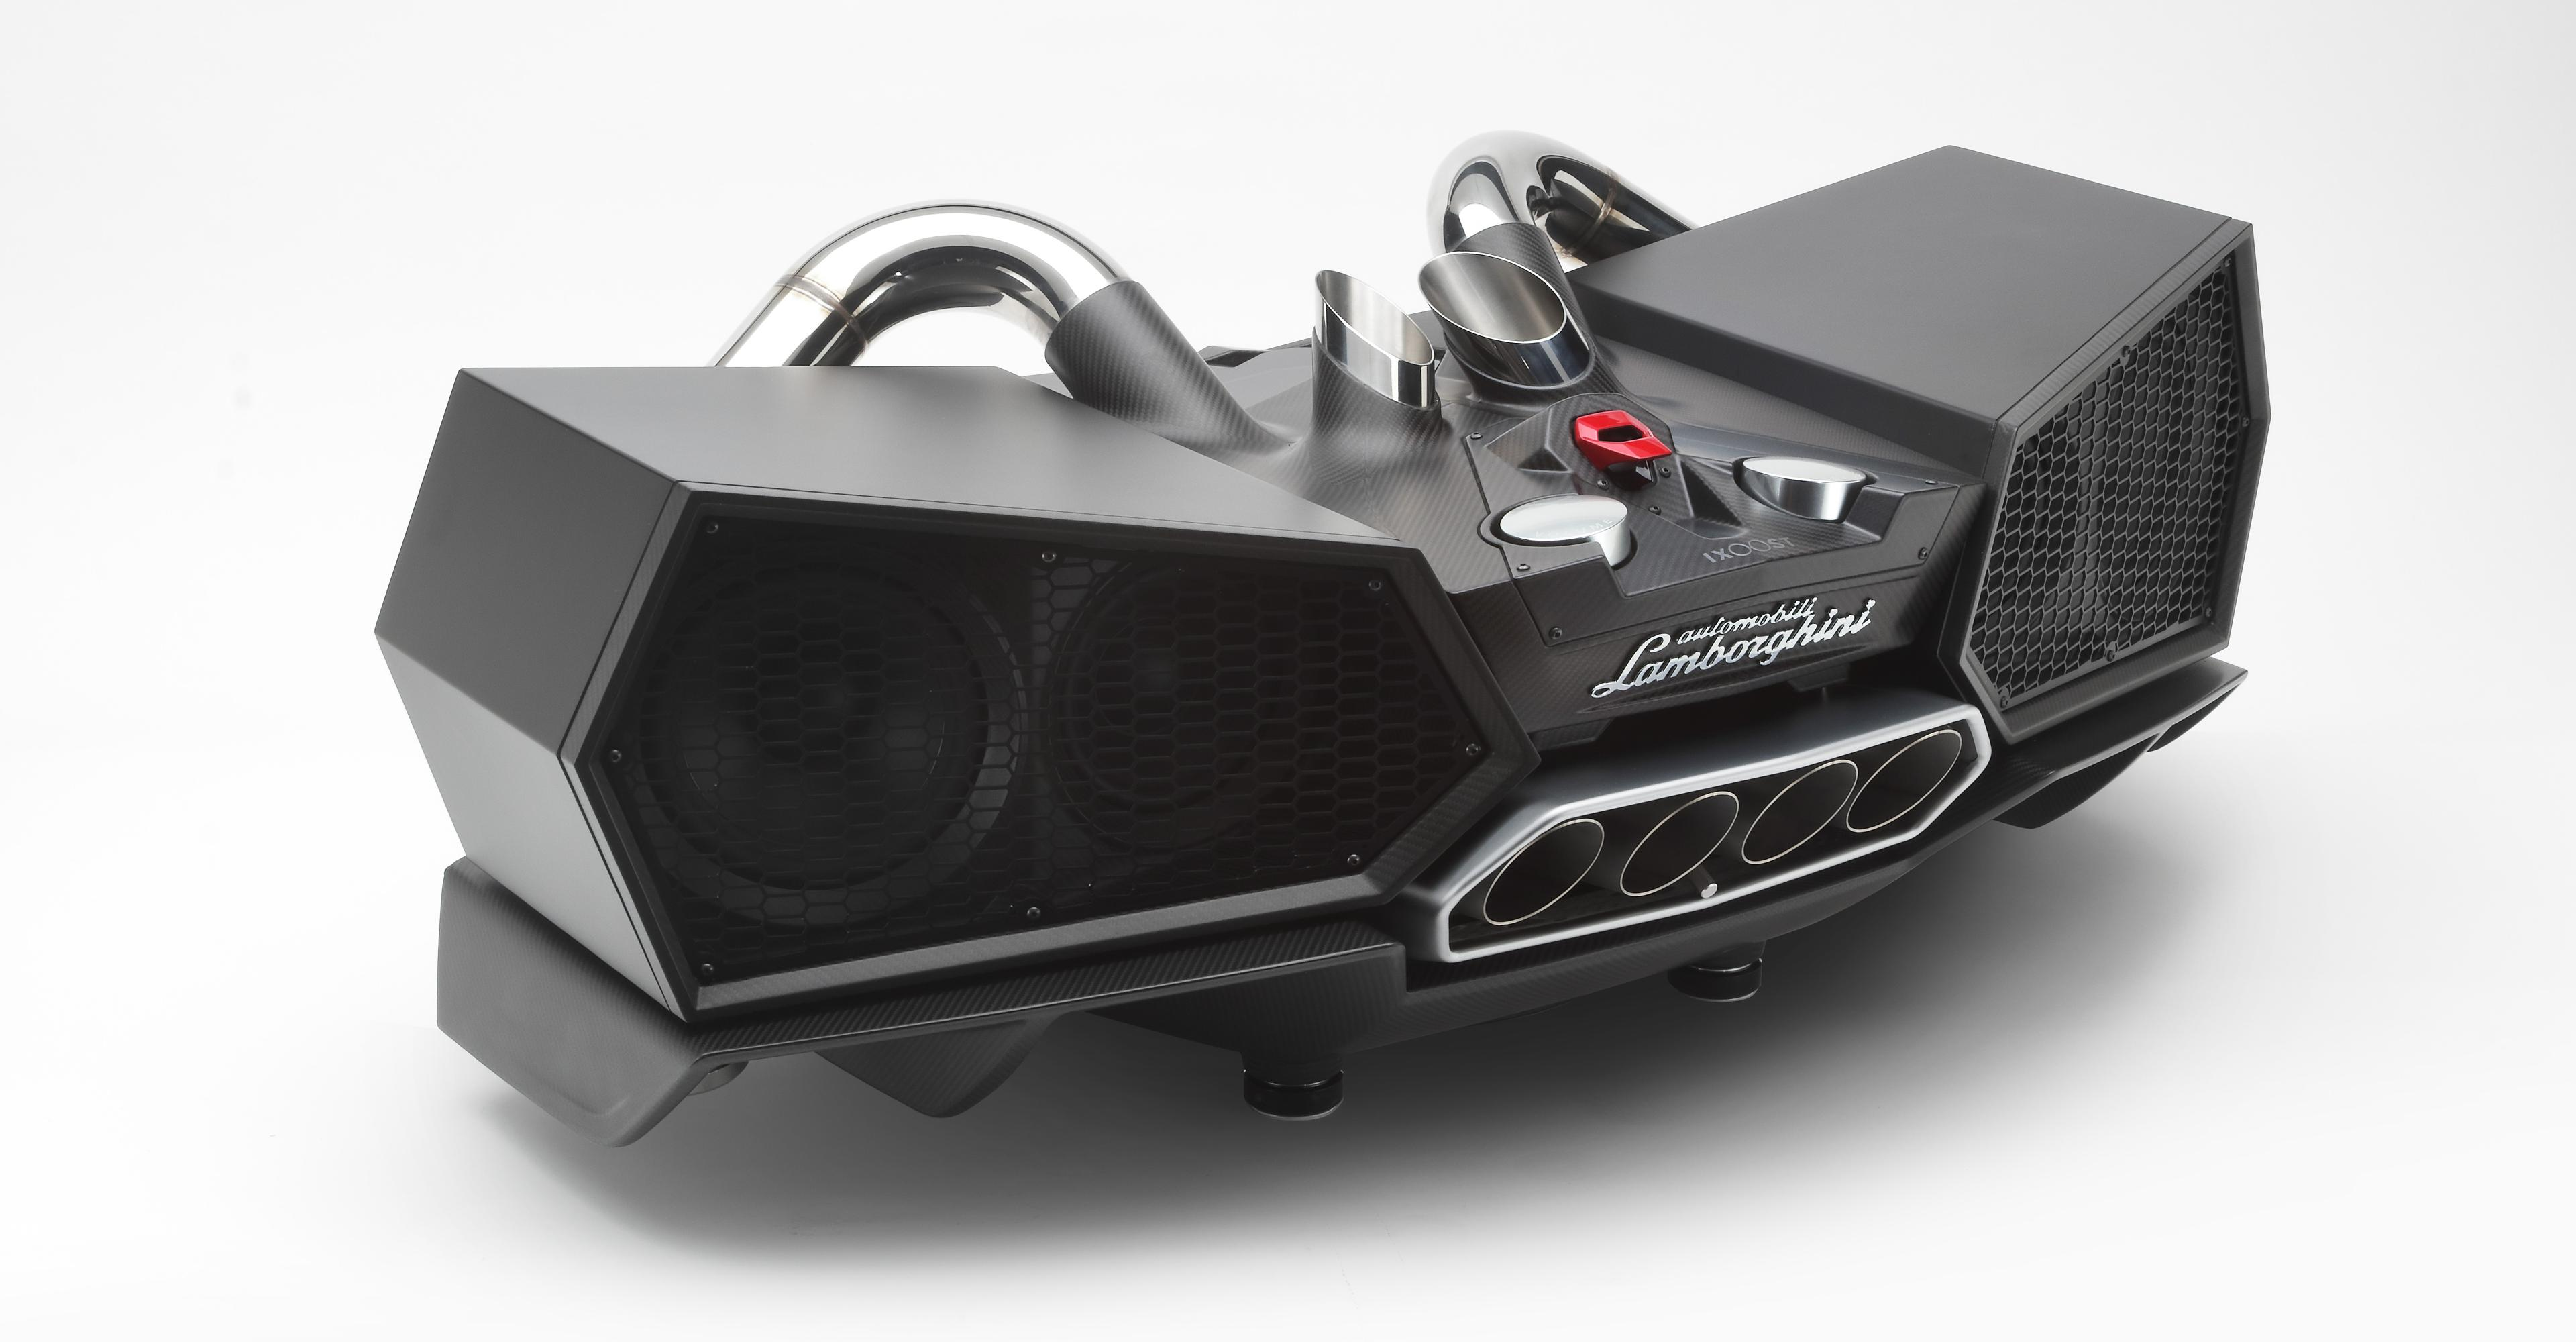 EsaVox: A Lamborghini-Infused Audio System